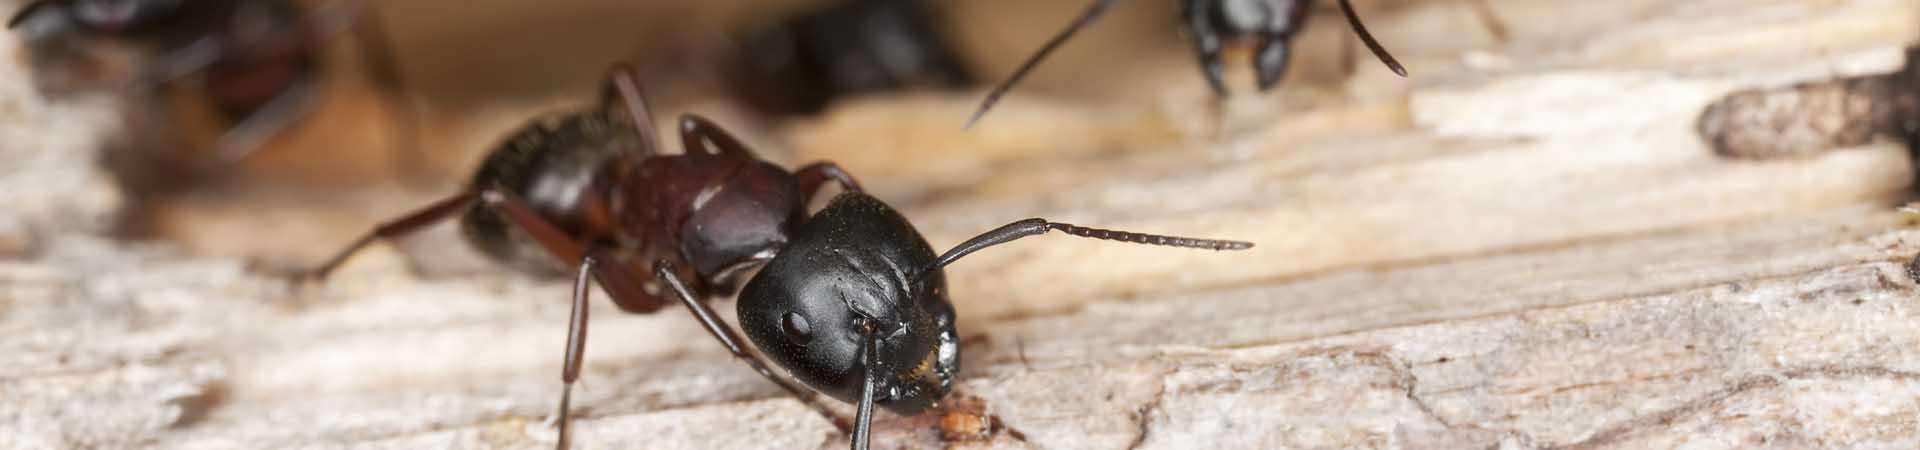 mainslide_ants_2